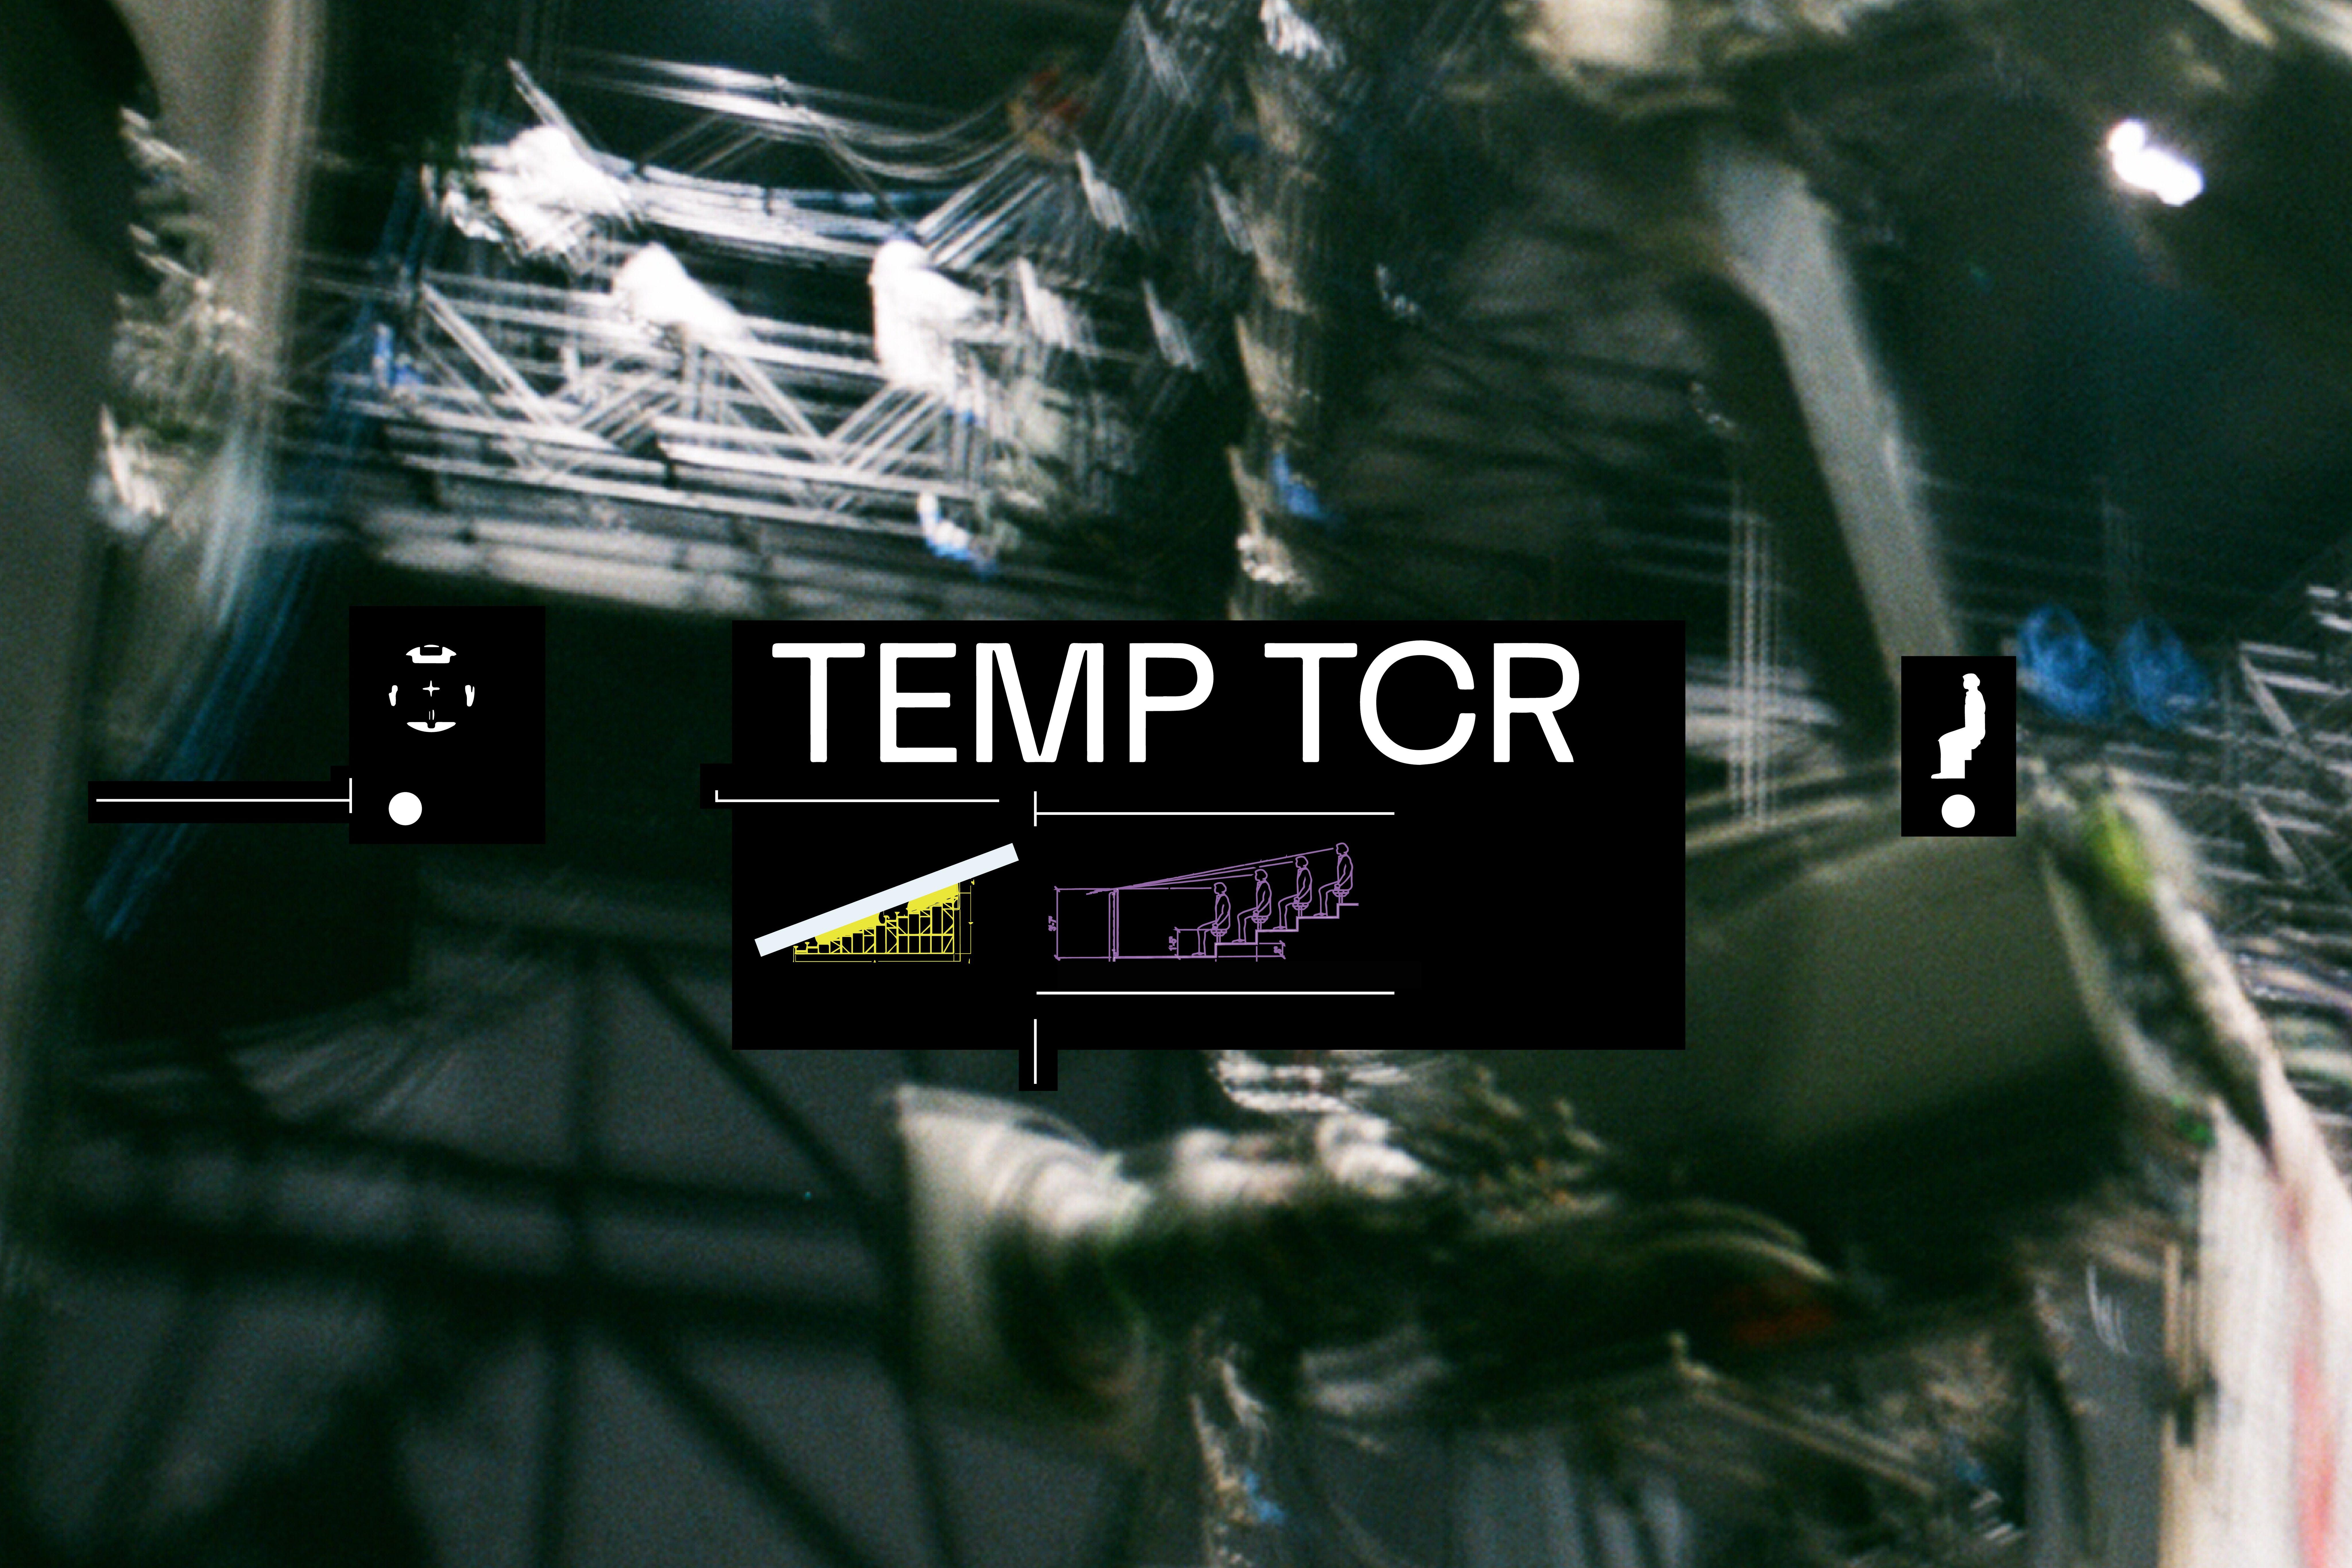 TEMP TCR